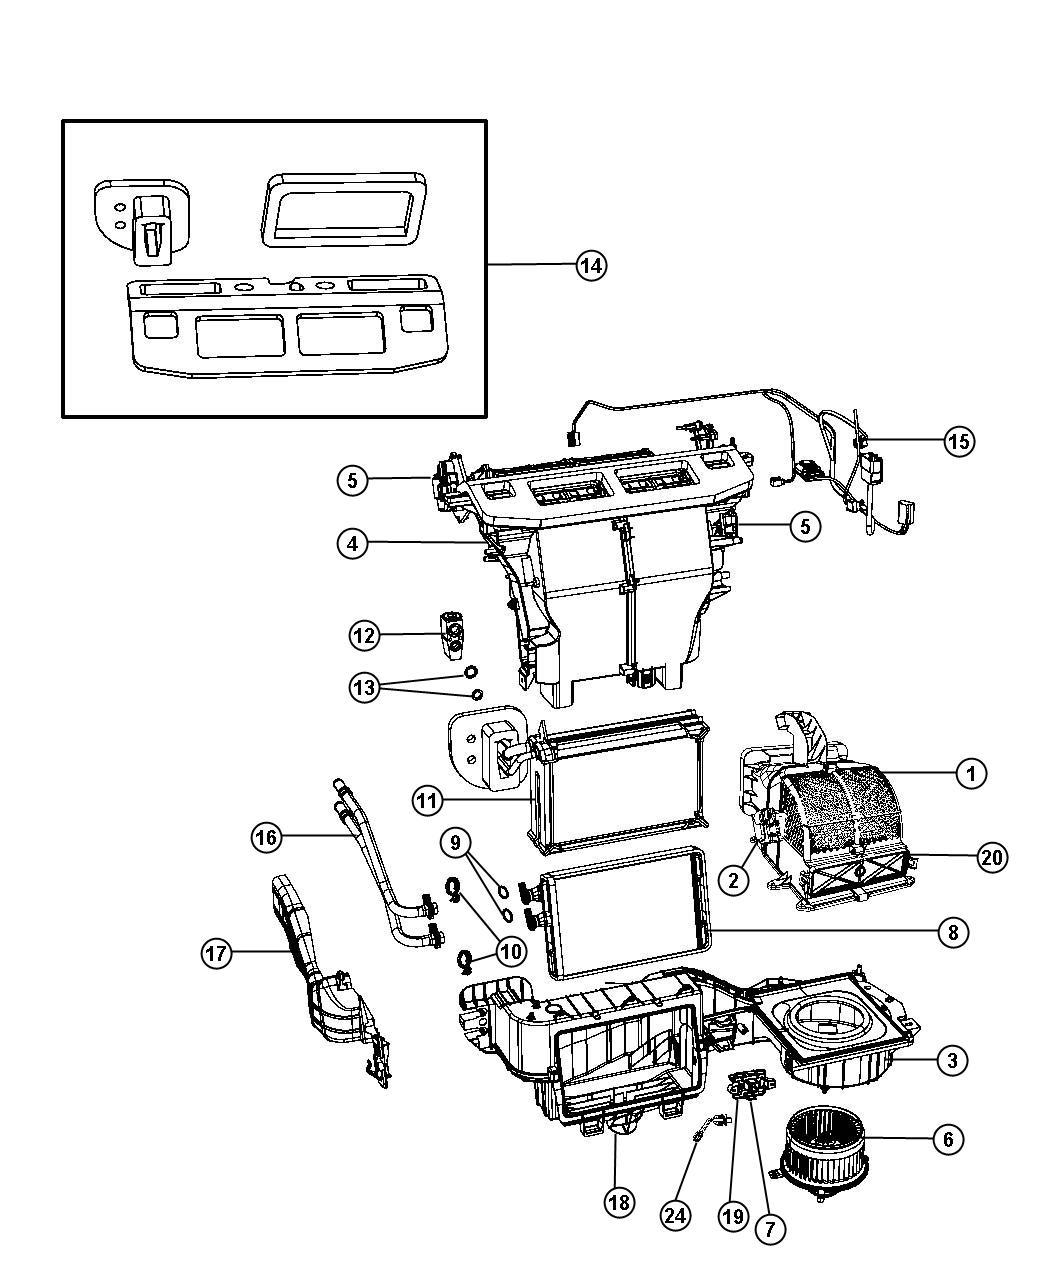 2006 Ford F650 Fuse Box Diagram. Ford. AutosMoviles.Com